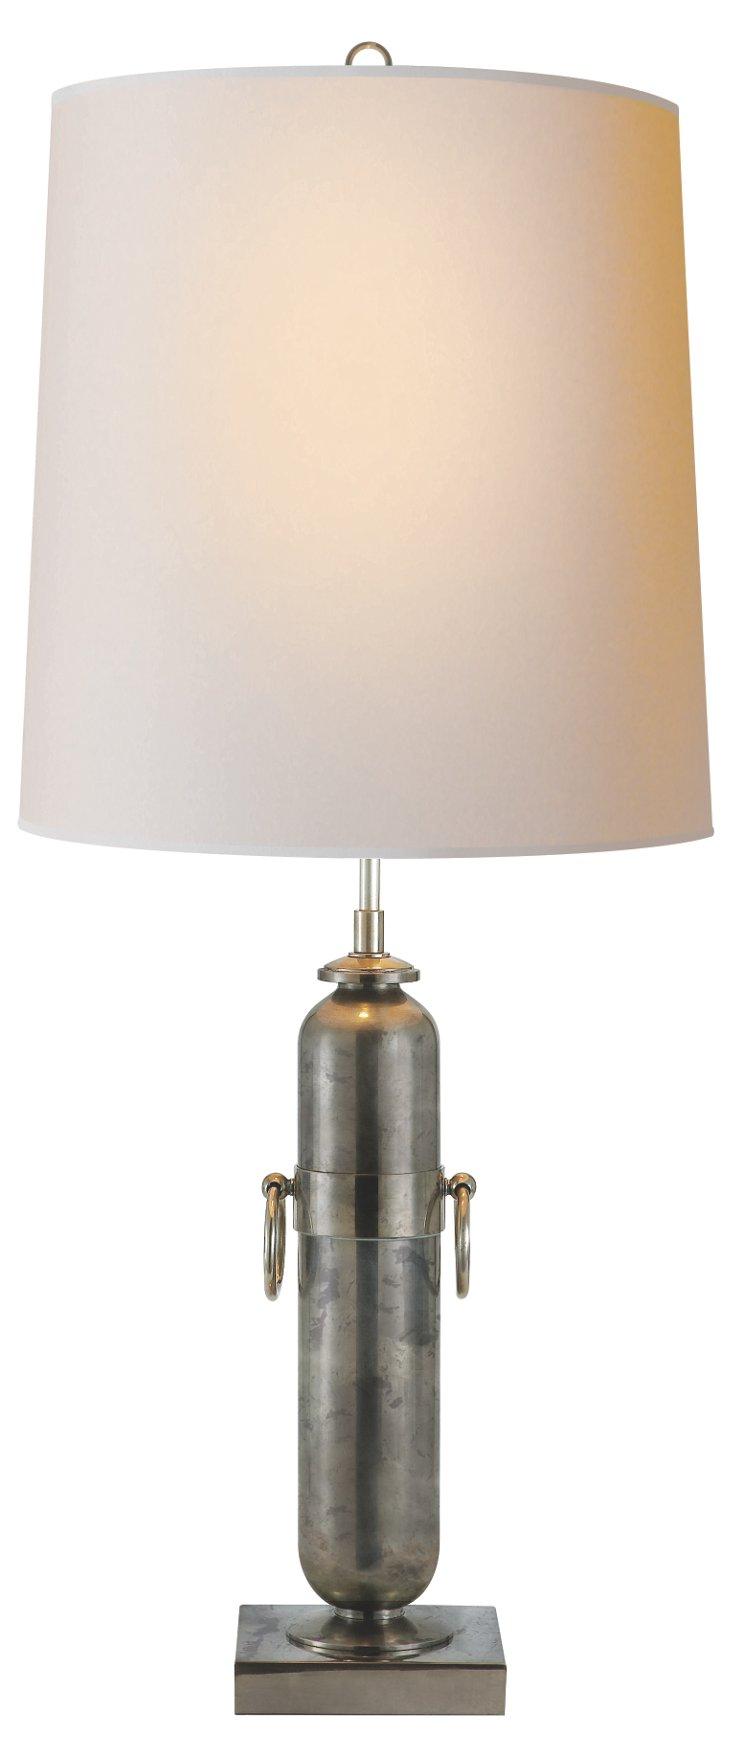 Jonathan Table Lamp, Sheffield Nickel